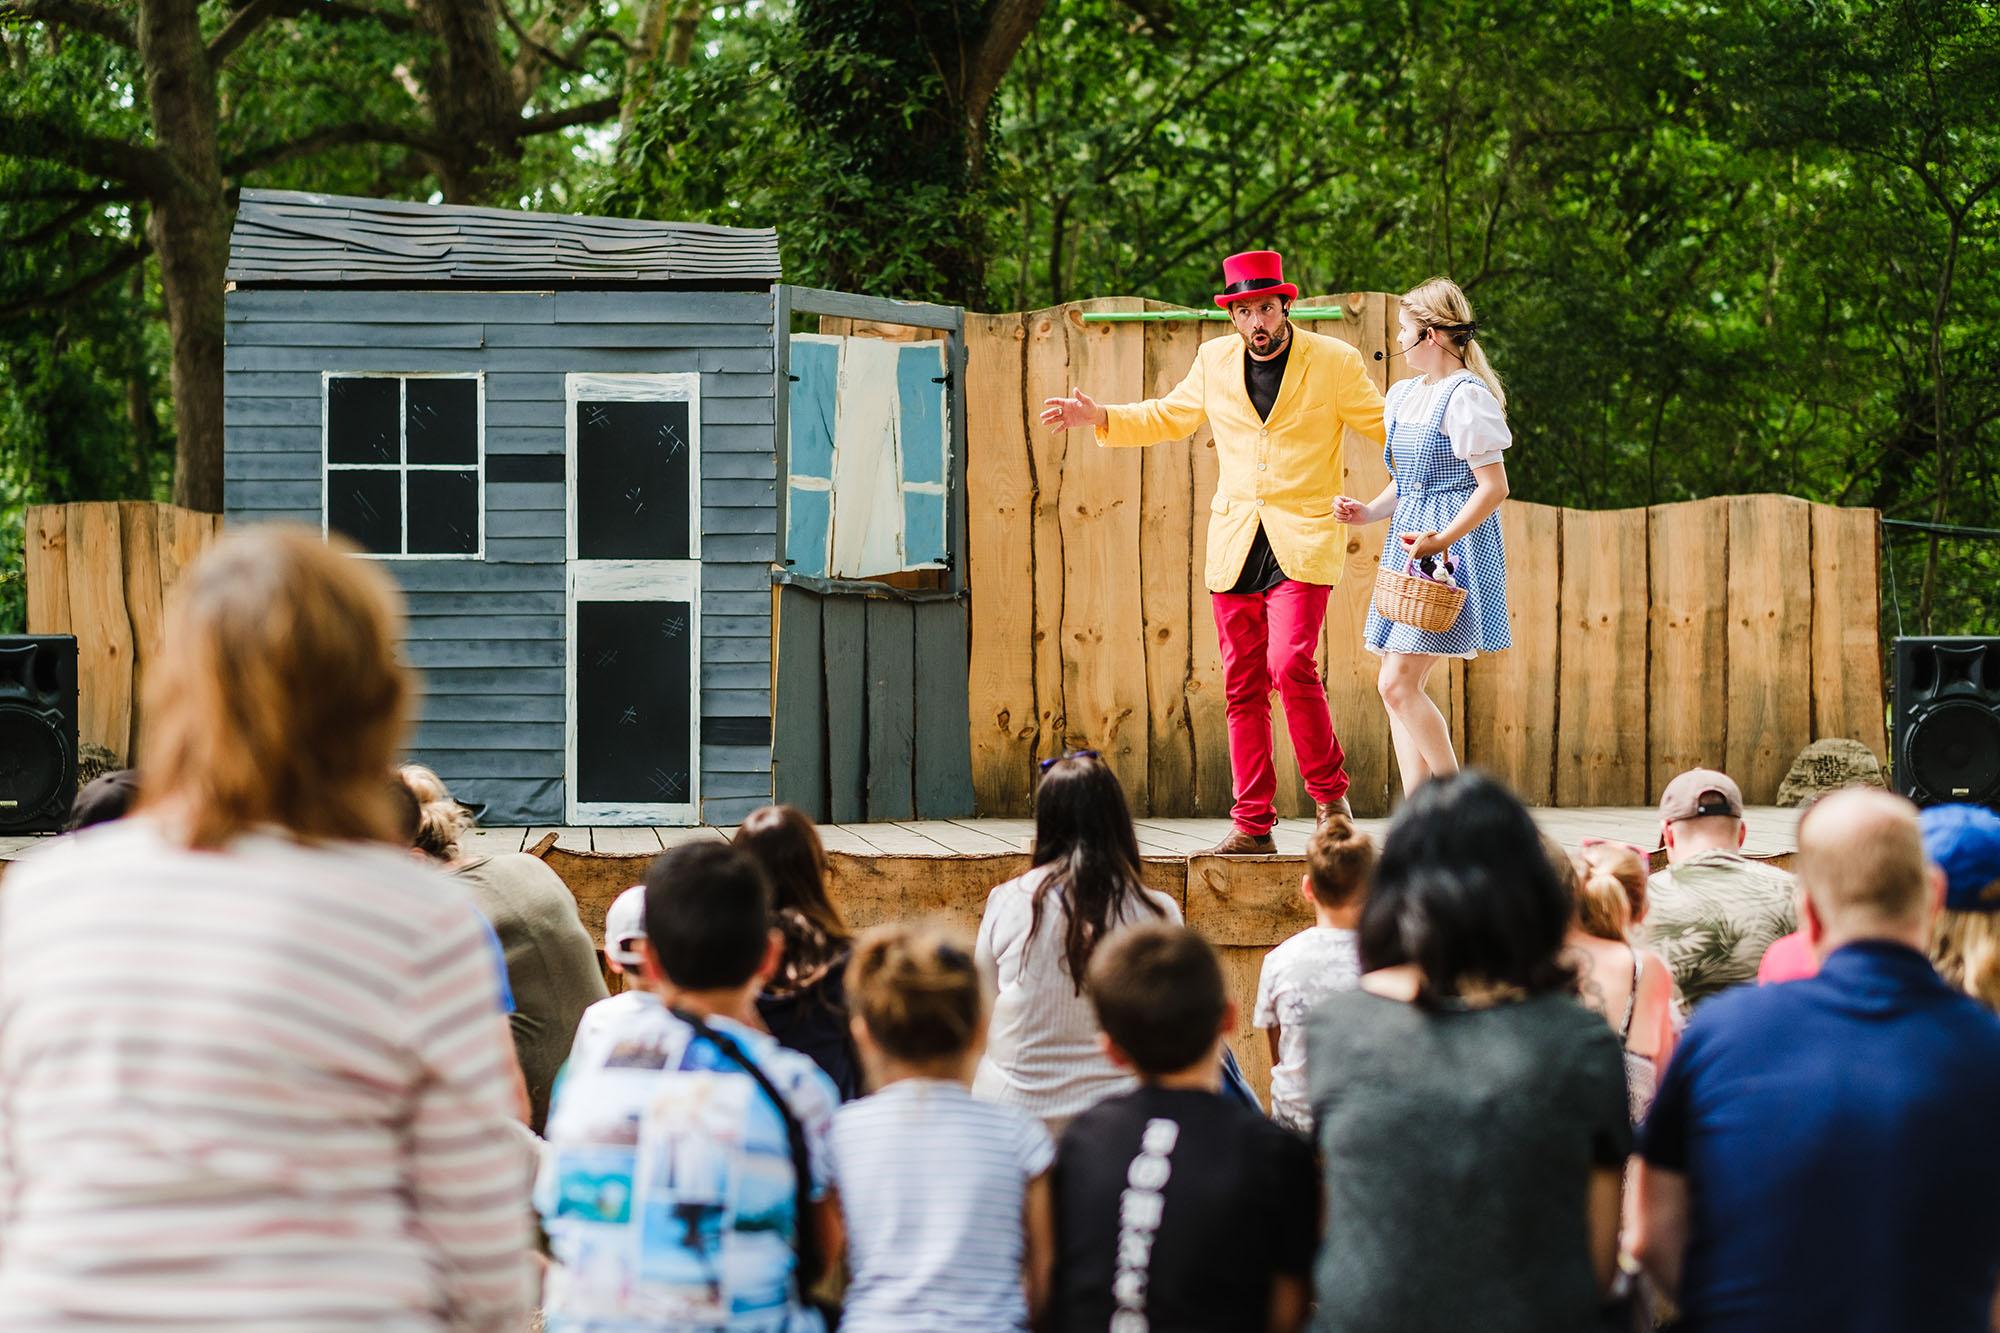 Groombridge place open air theatre